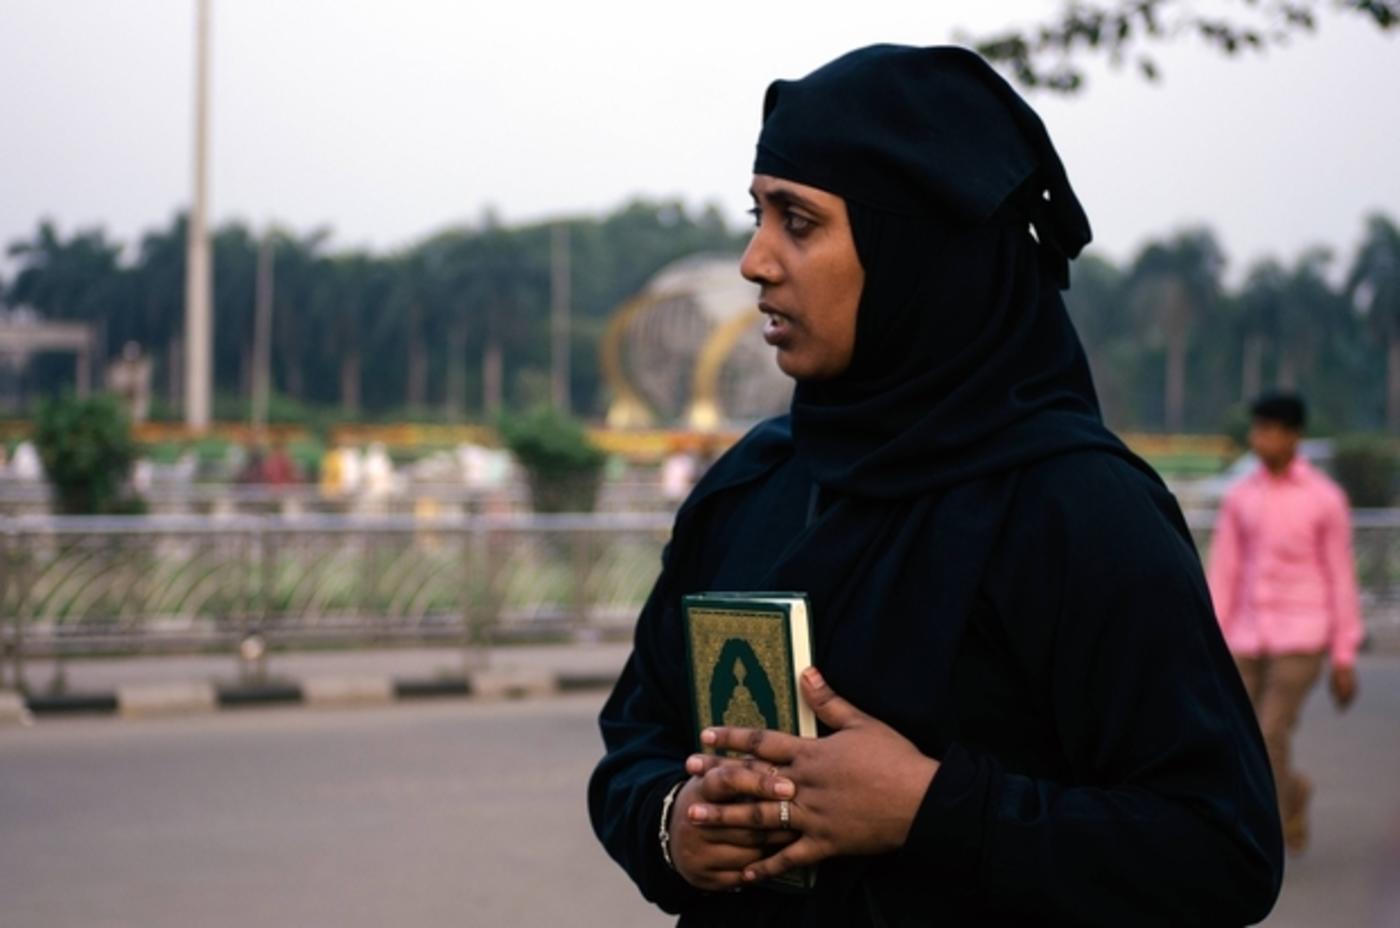 Arabie saoudite fille datant